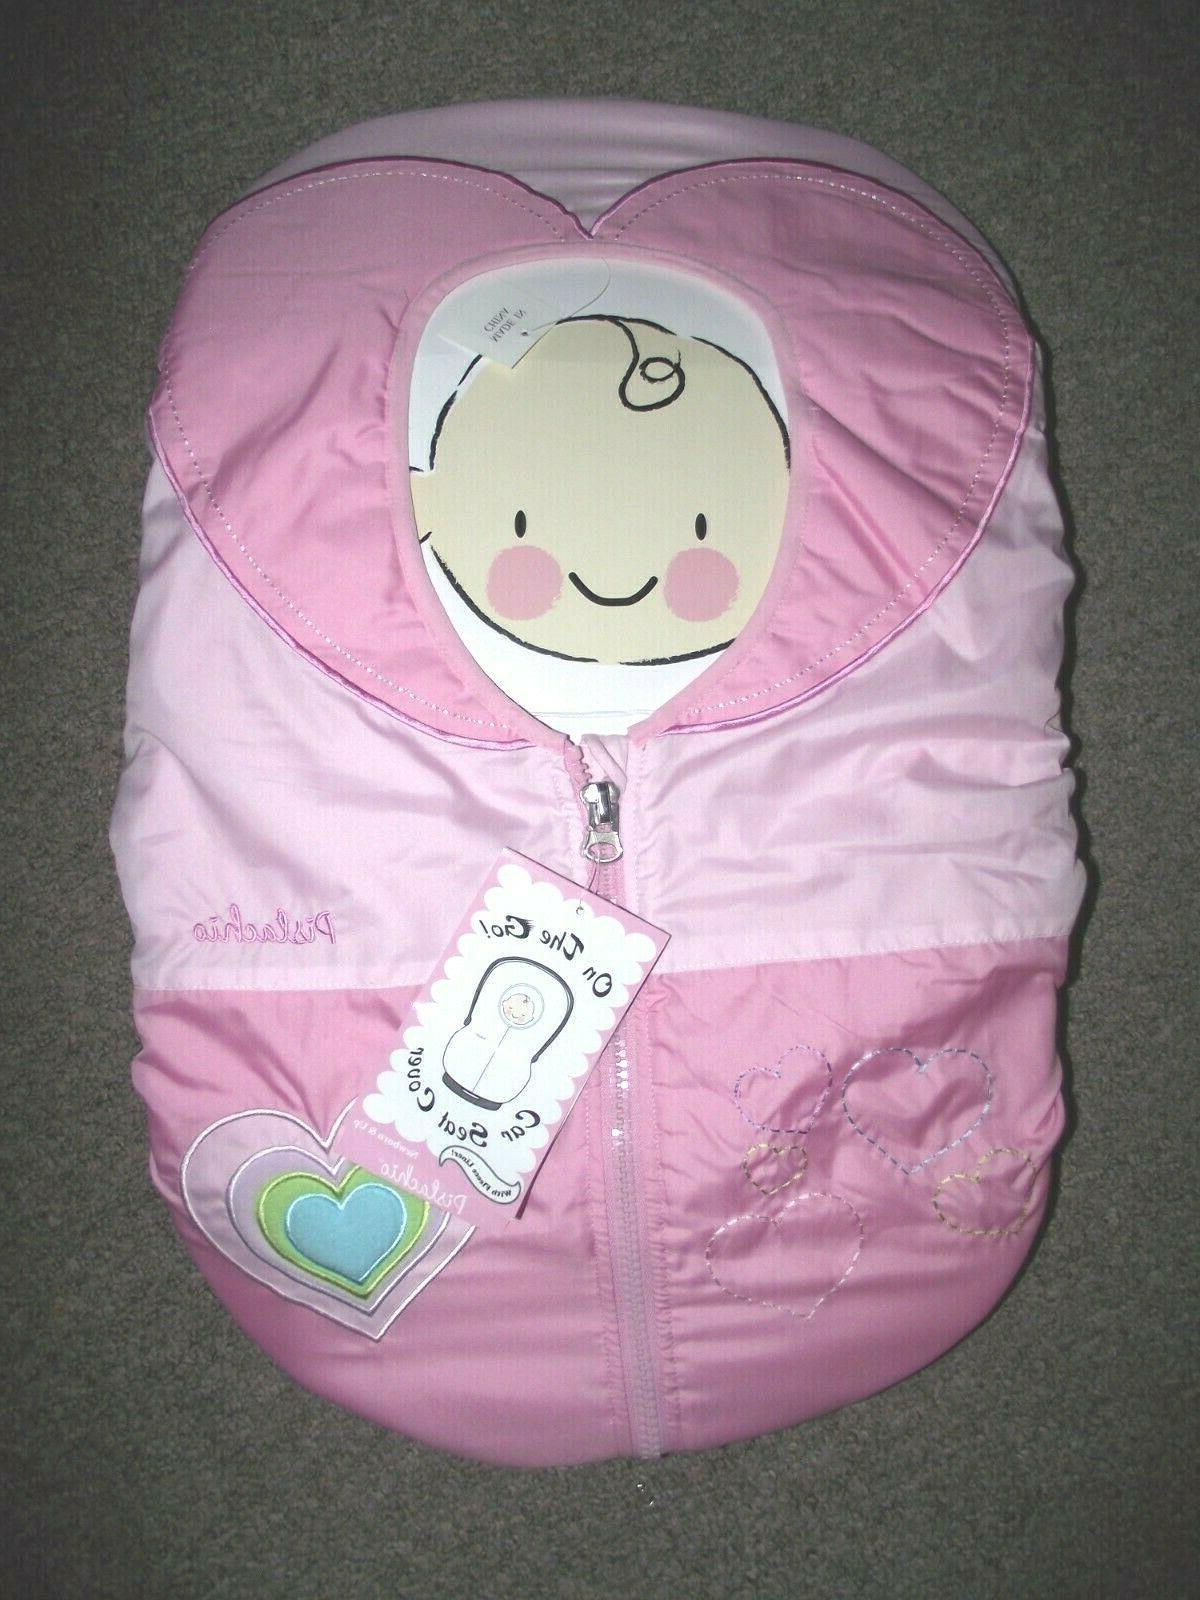 nip brand baby car seat cover